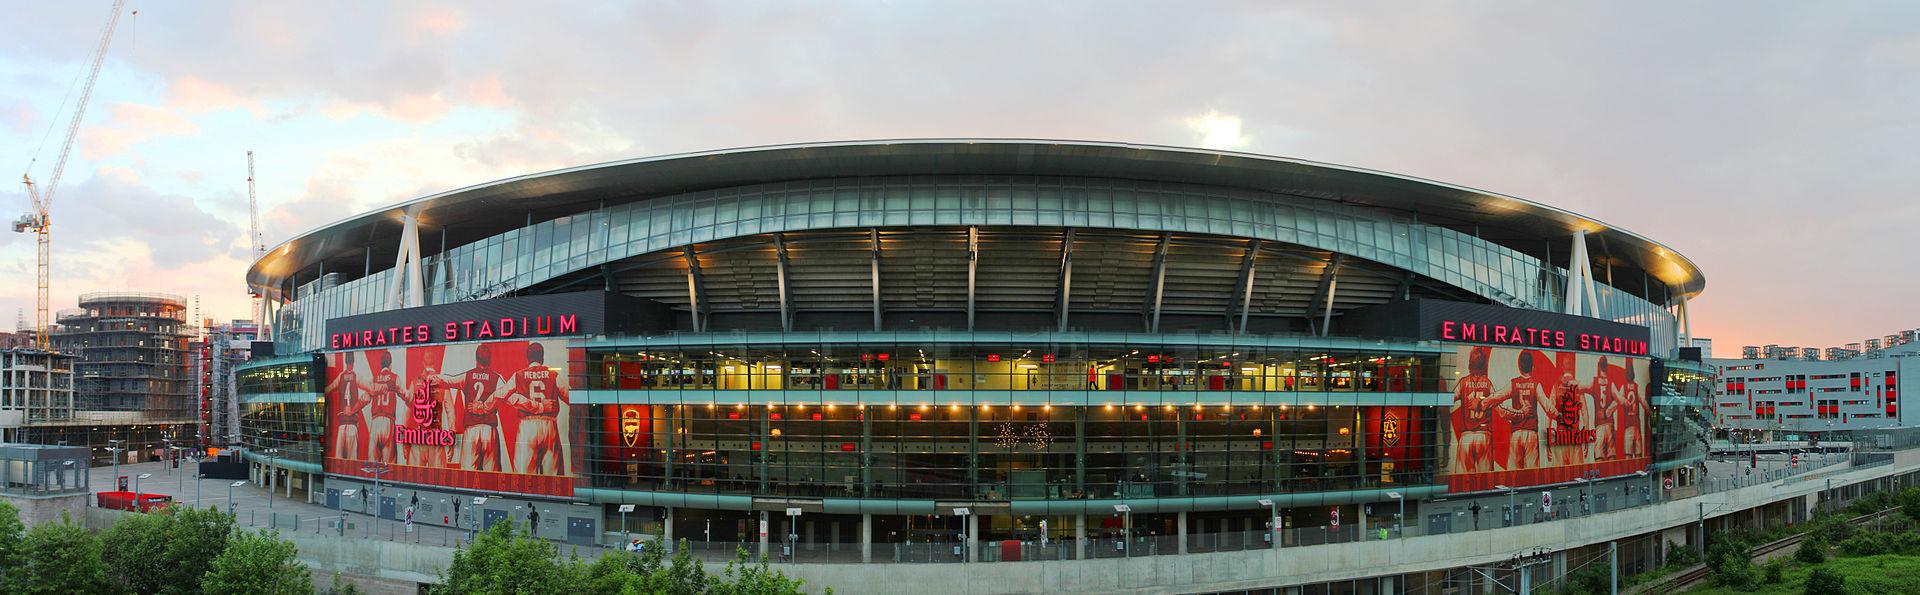 Emirates Stadium, estádio do Arsenal